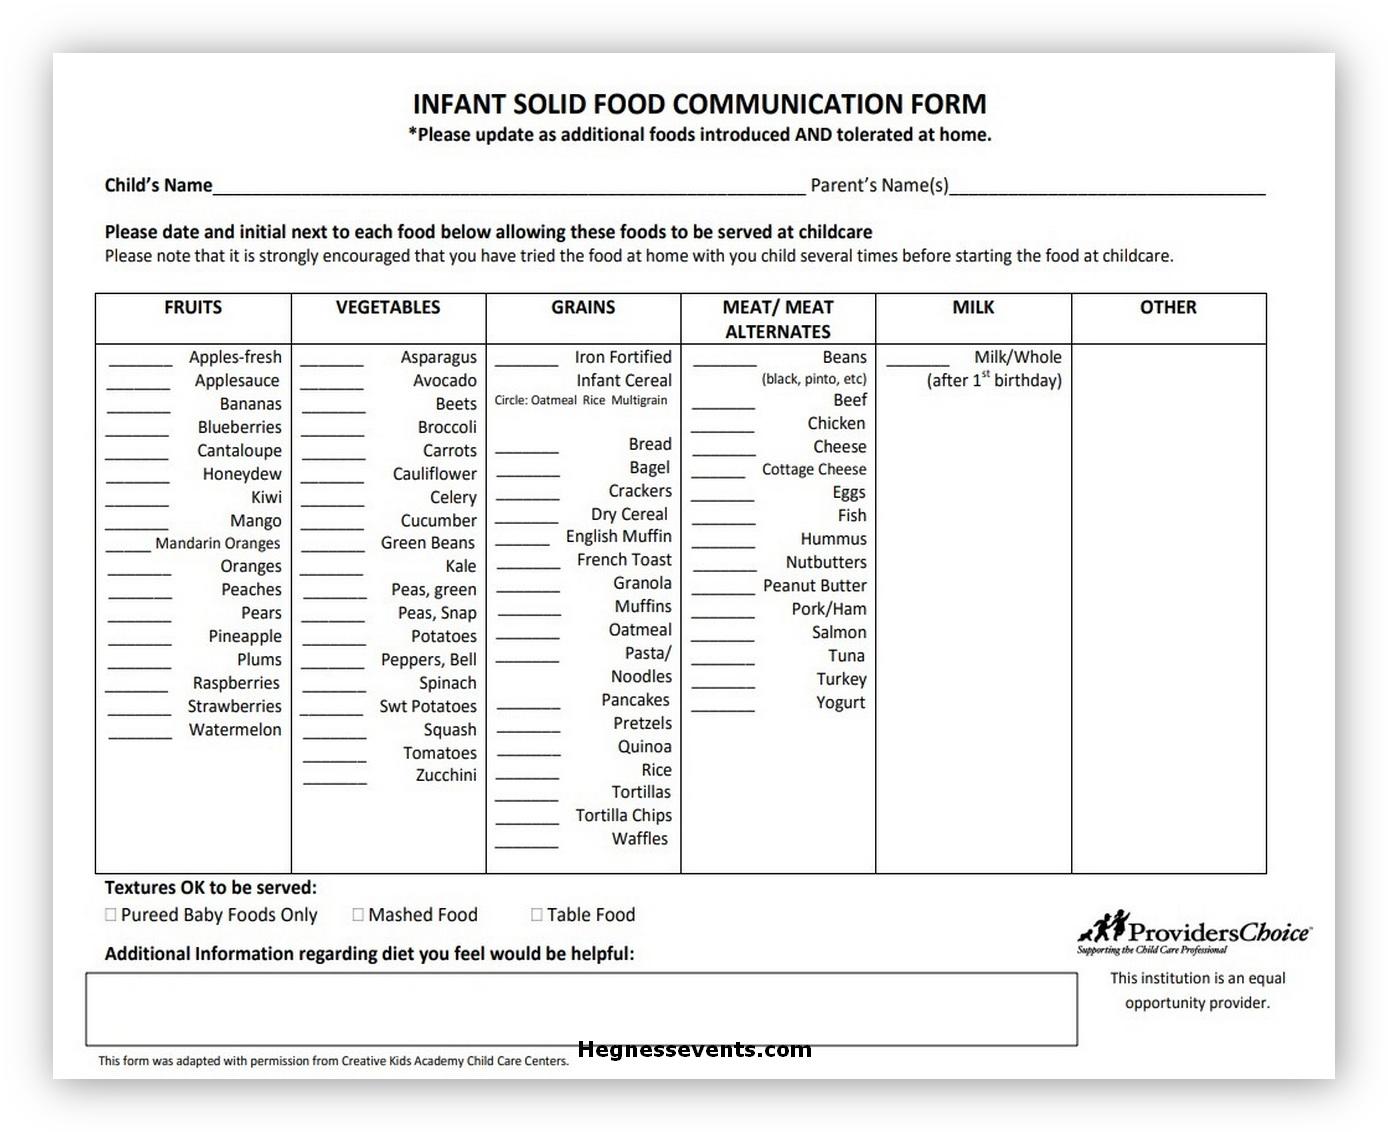 Food Communication Form